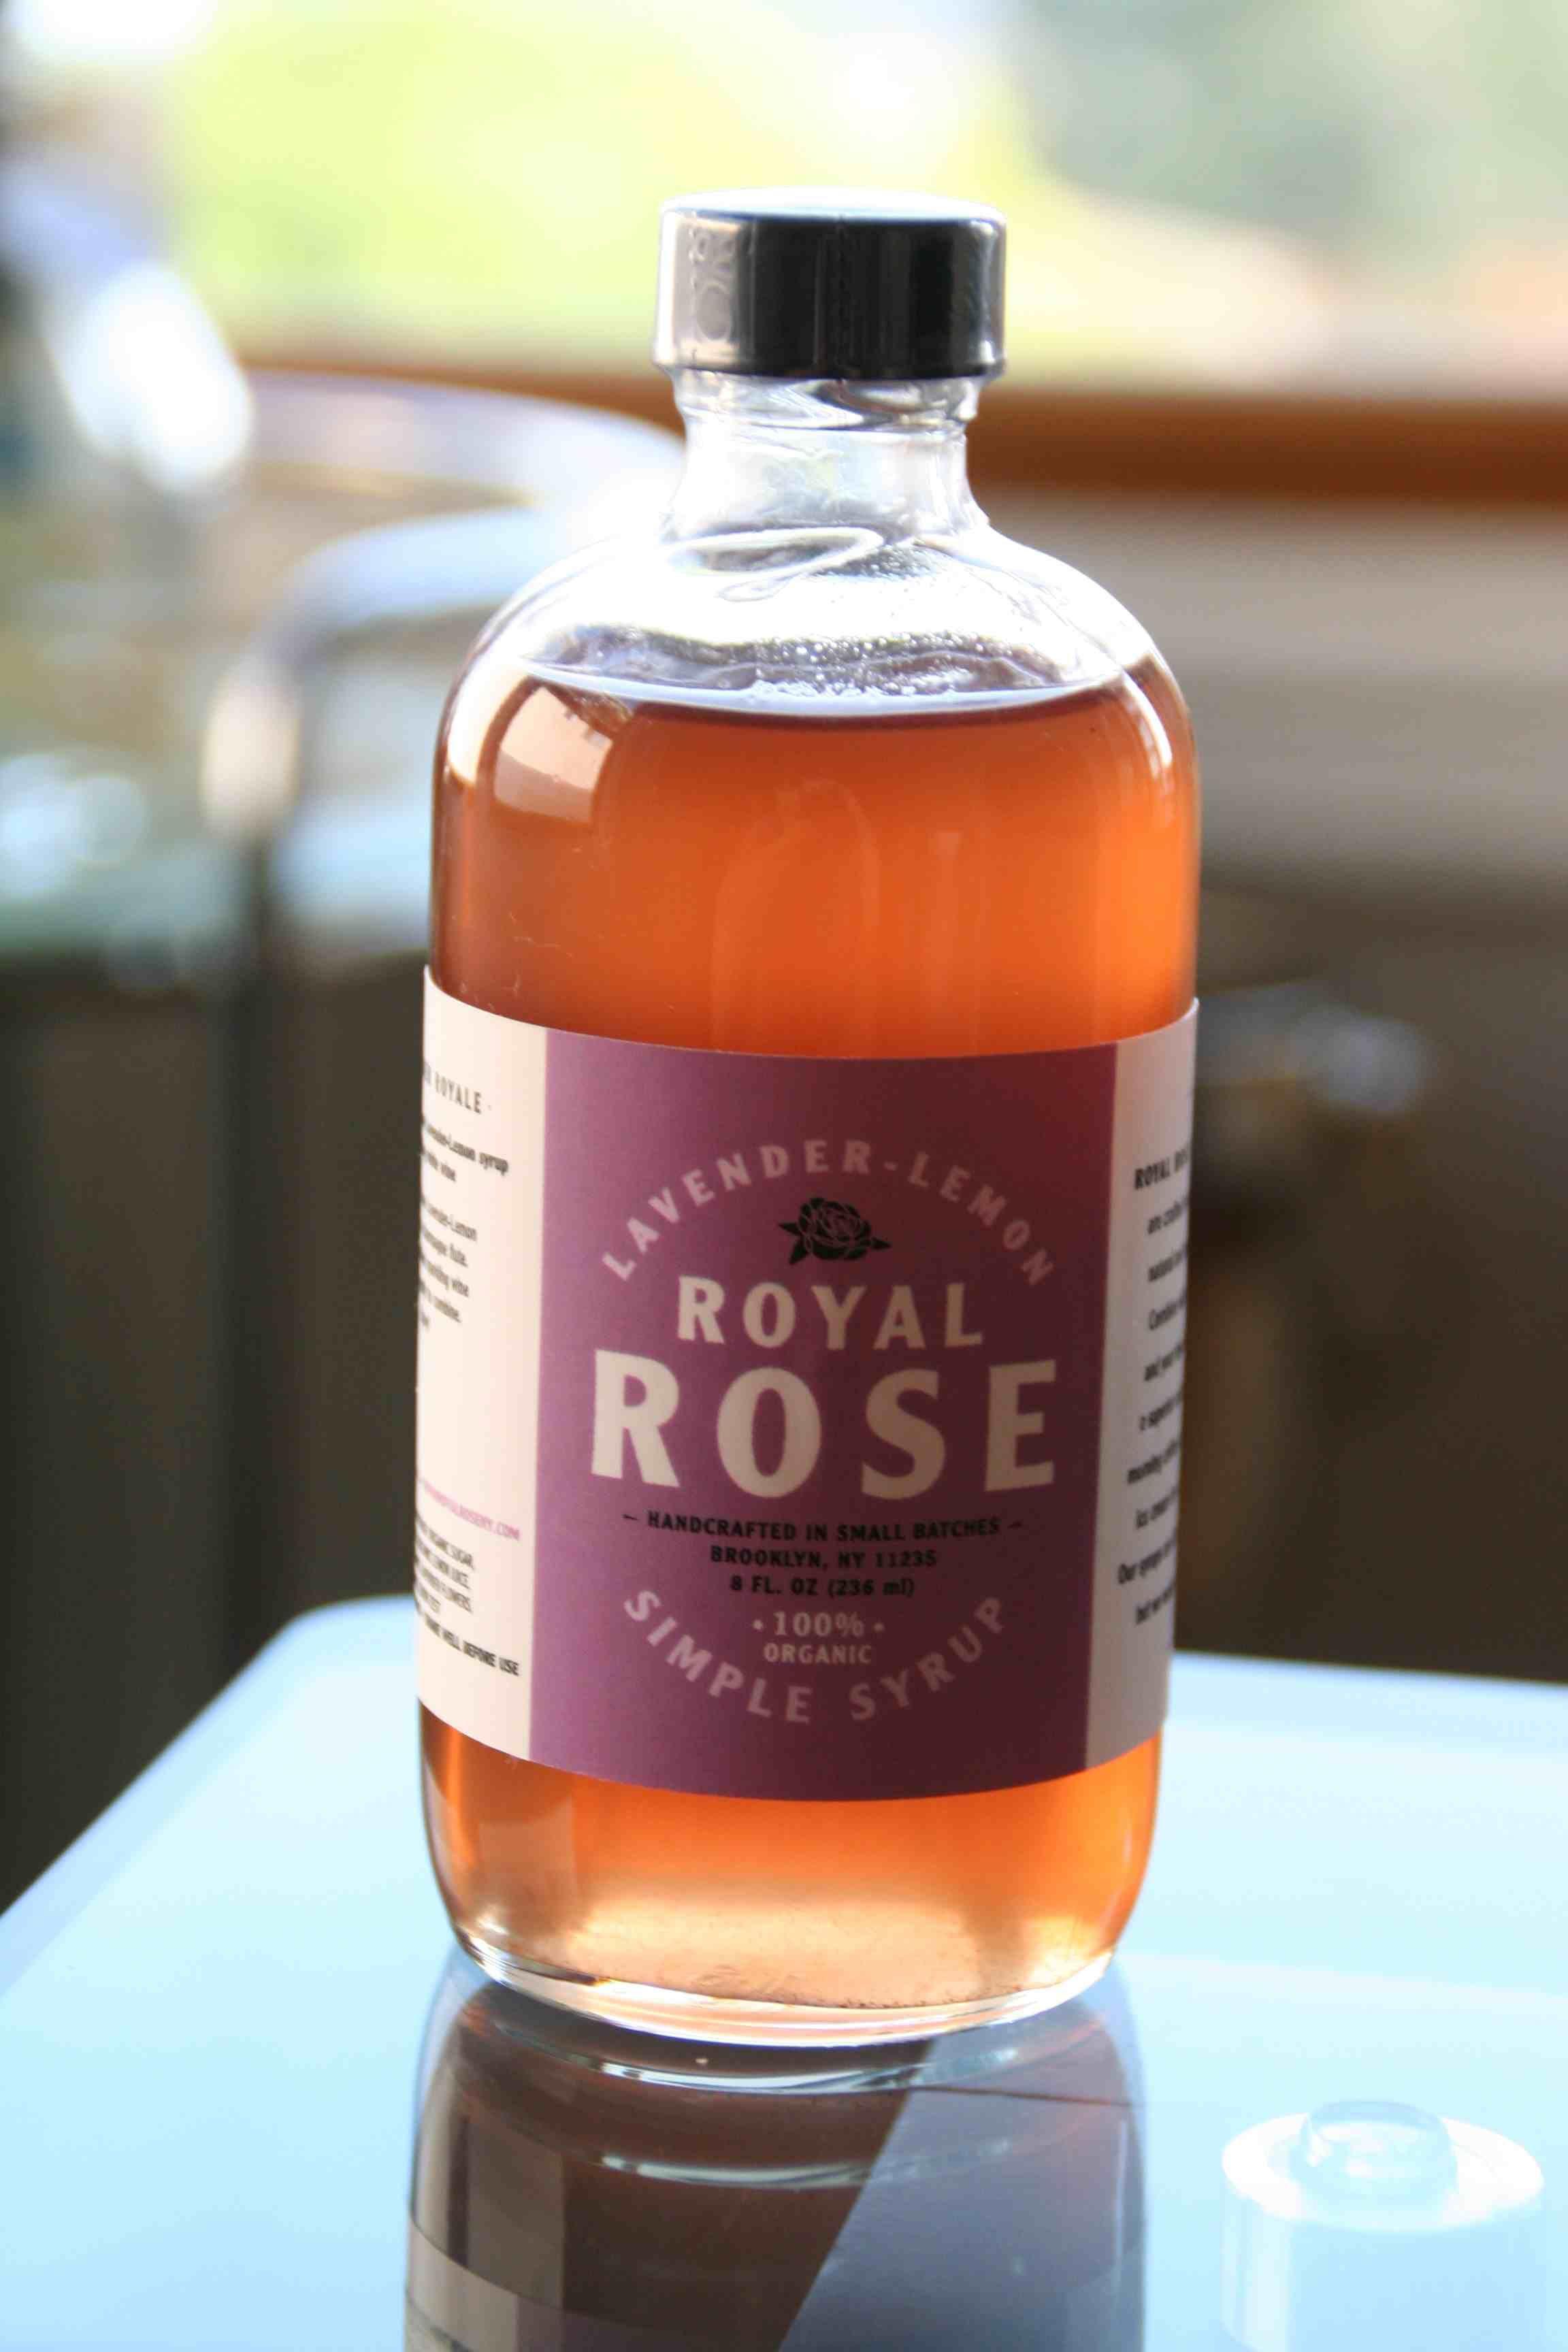 Royal Rose Simple Syrup Wine Bottle Whiskey Bottle Rose Wine Bottle